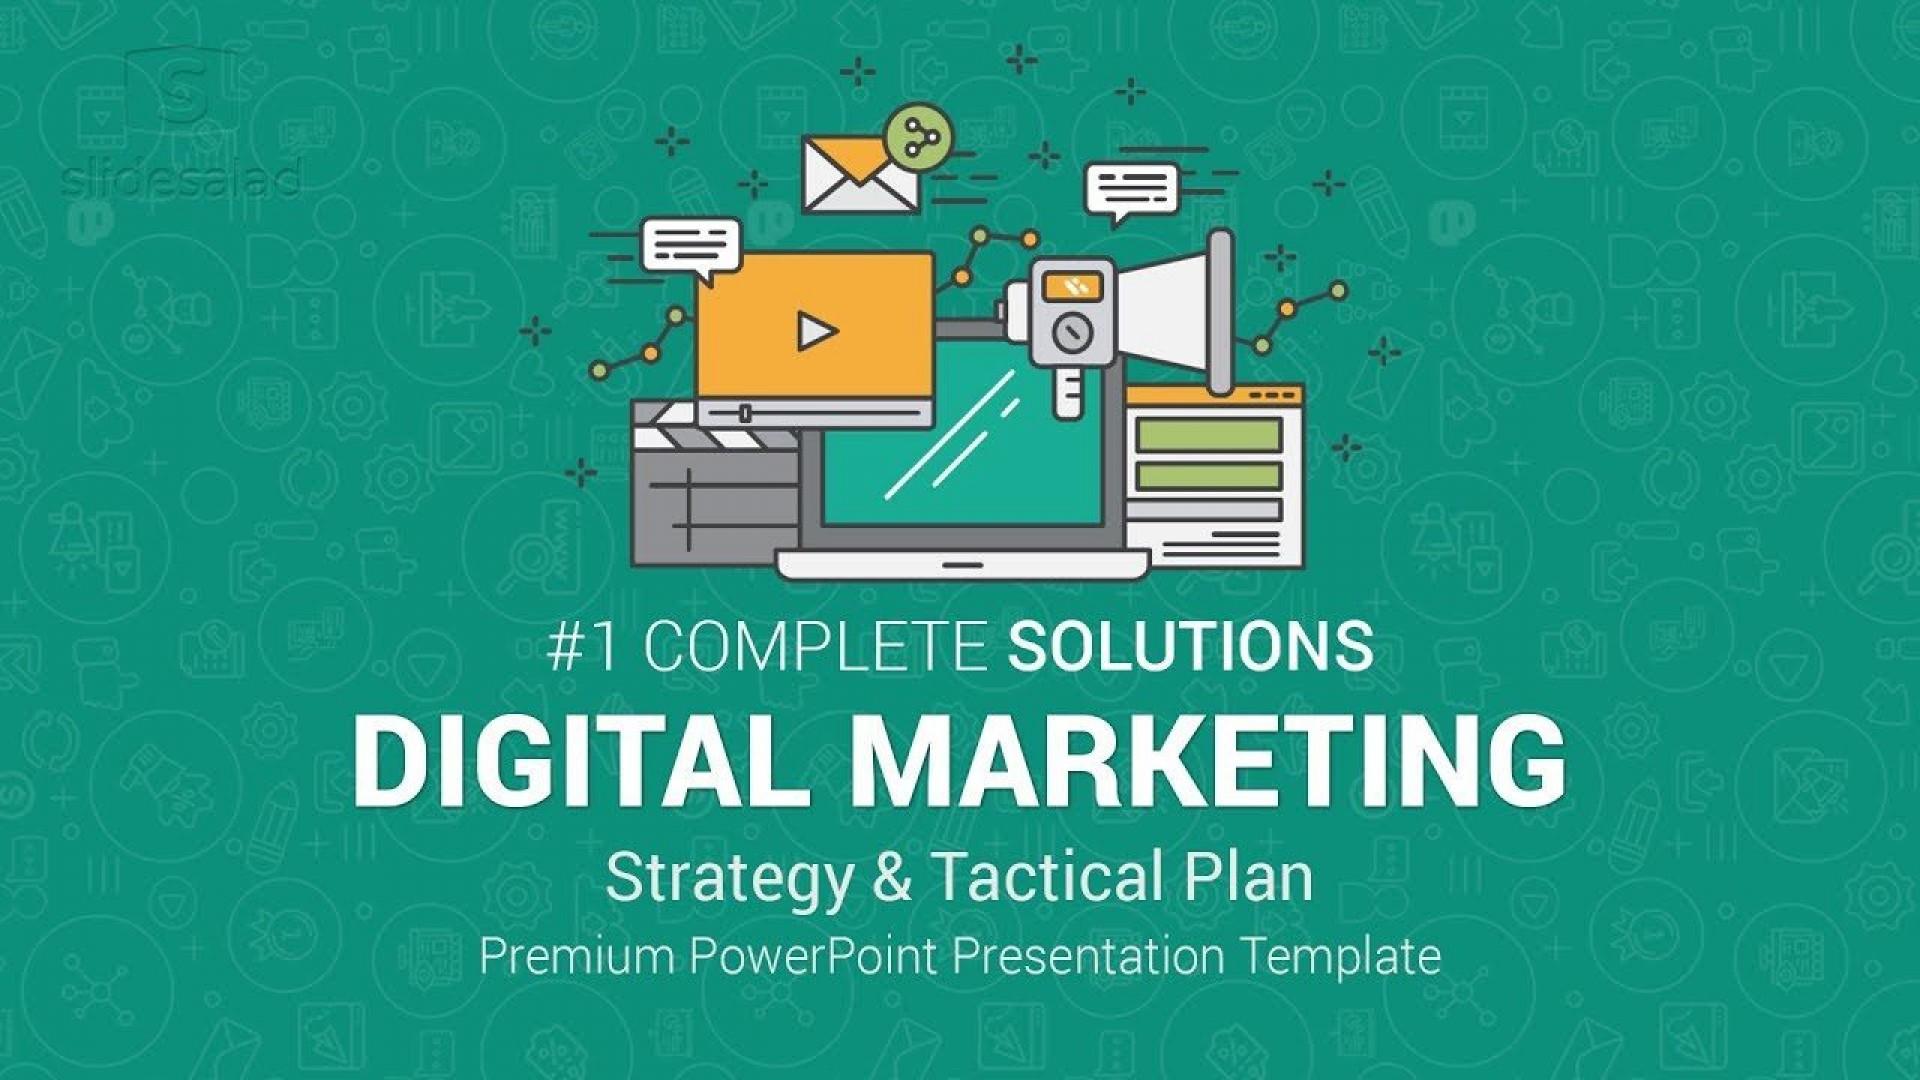 009 Stupendou Digital Marketing Plan Sample Ppt Highest Quality 1920